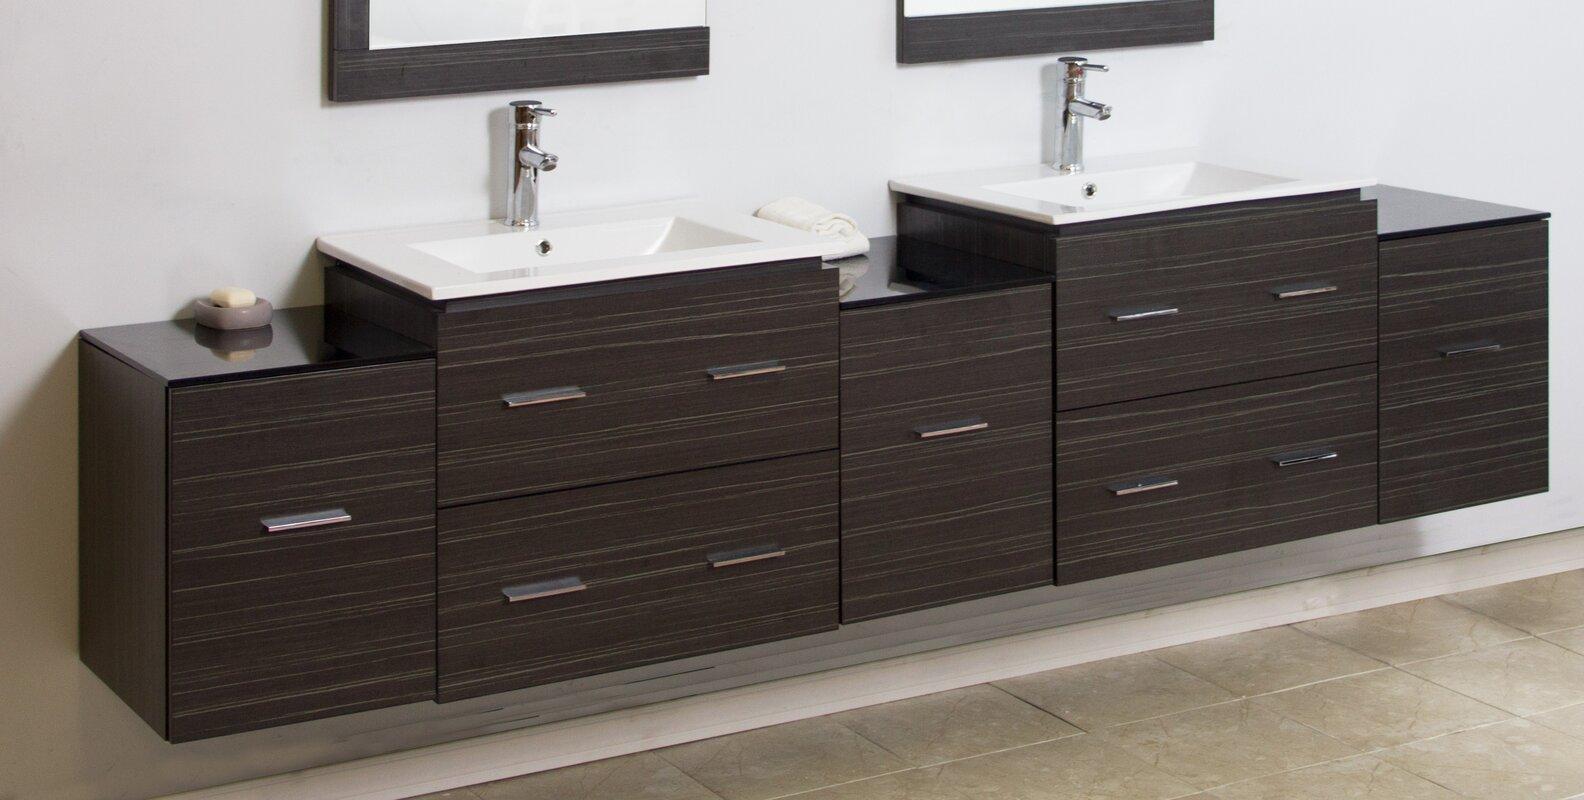 American imaginations 90 double modern wall mount bathroom vanity set reviews wayfair - Linden modern bathroom vanity set ...